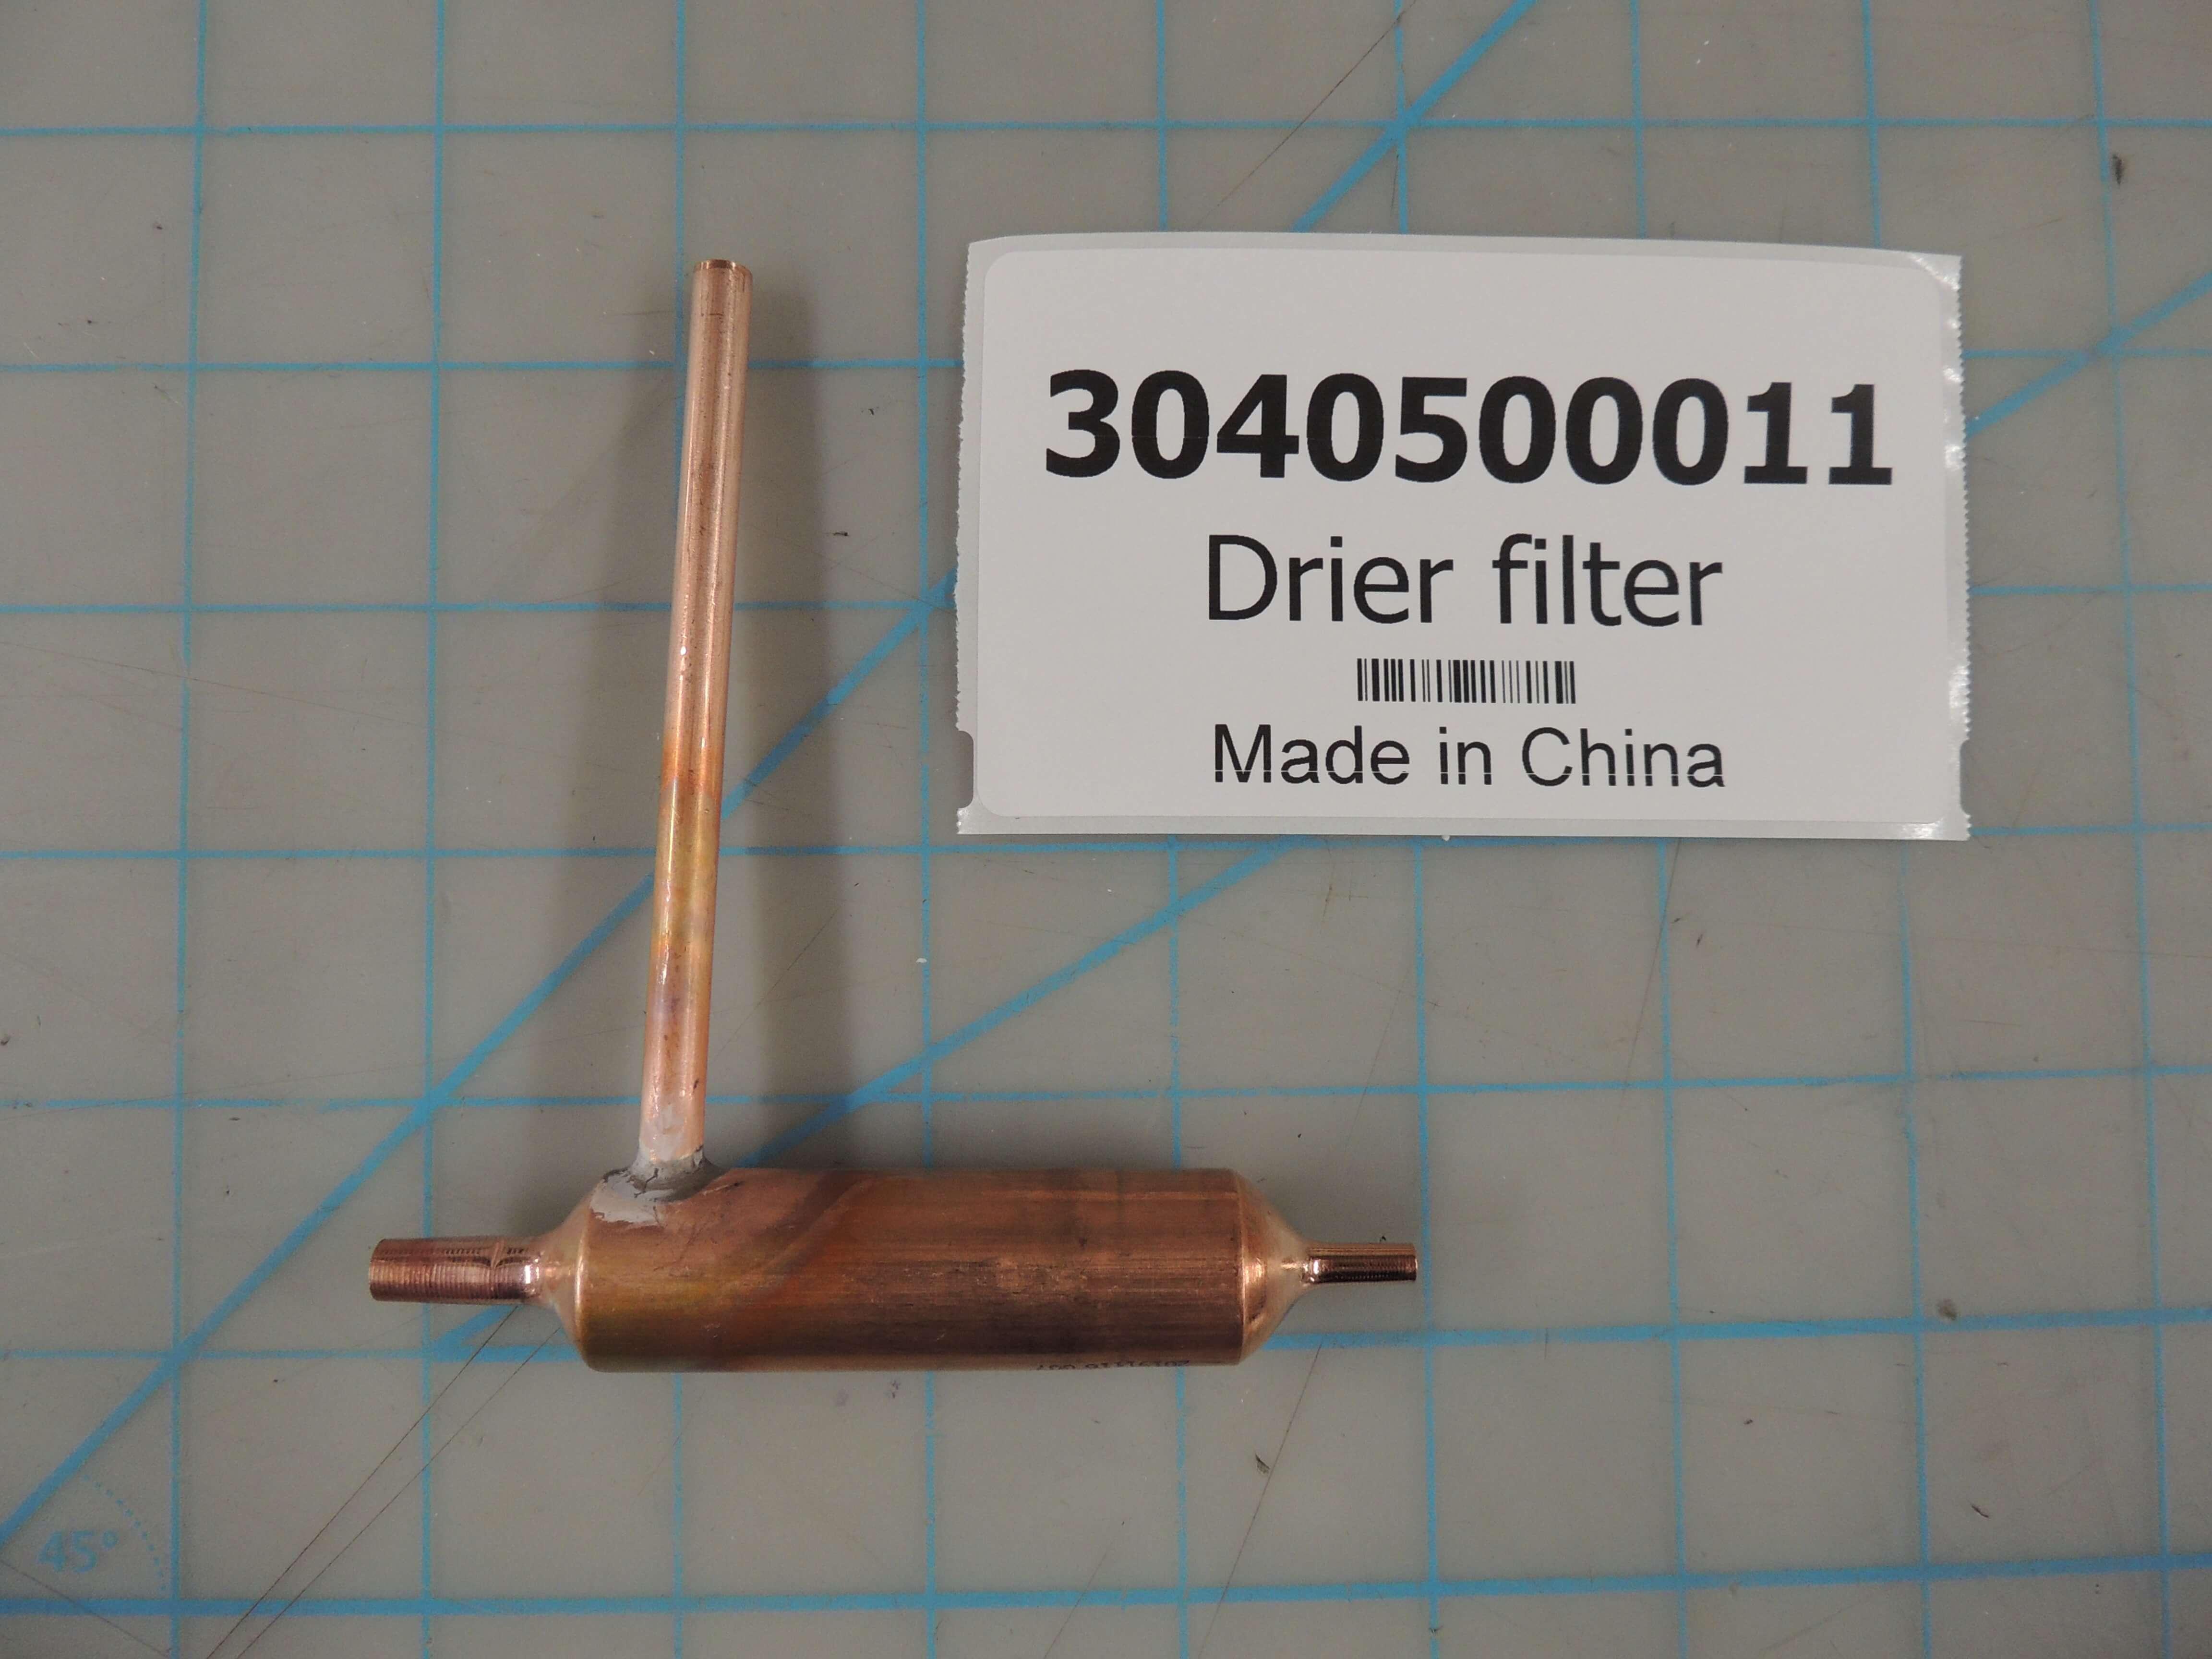 Drier filter